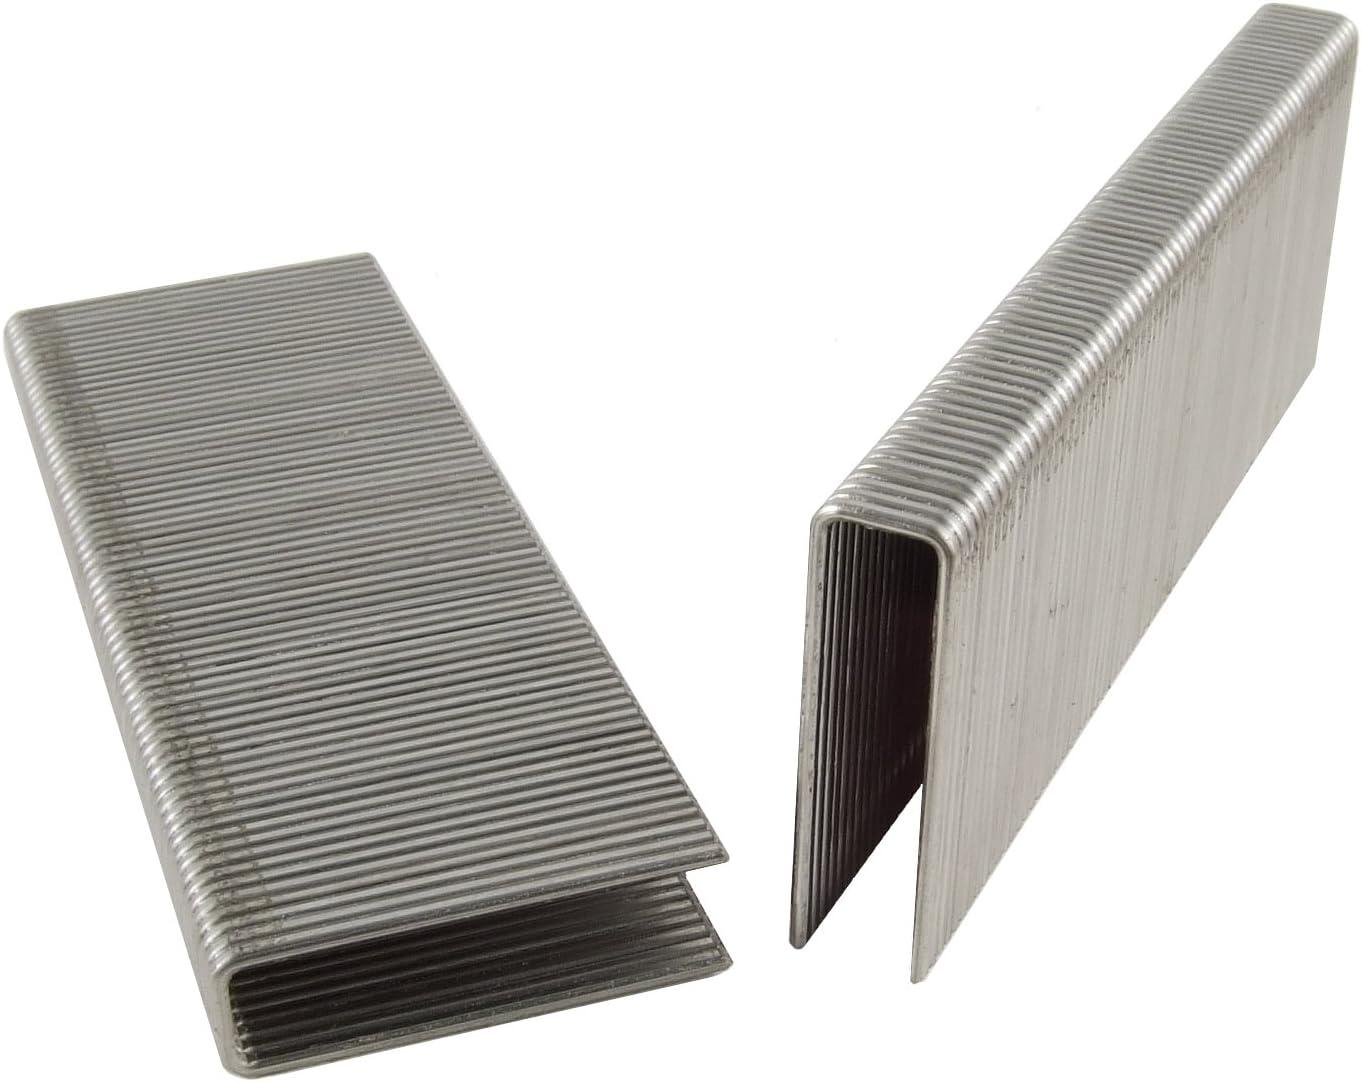 Wire Staples Senco Stainless Steel Steel Boxed 16 Ga